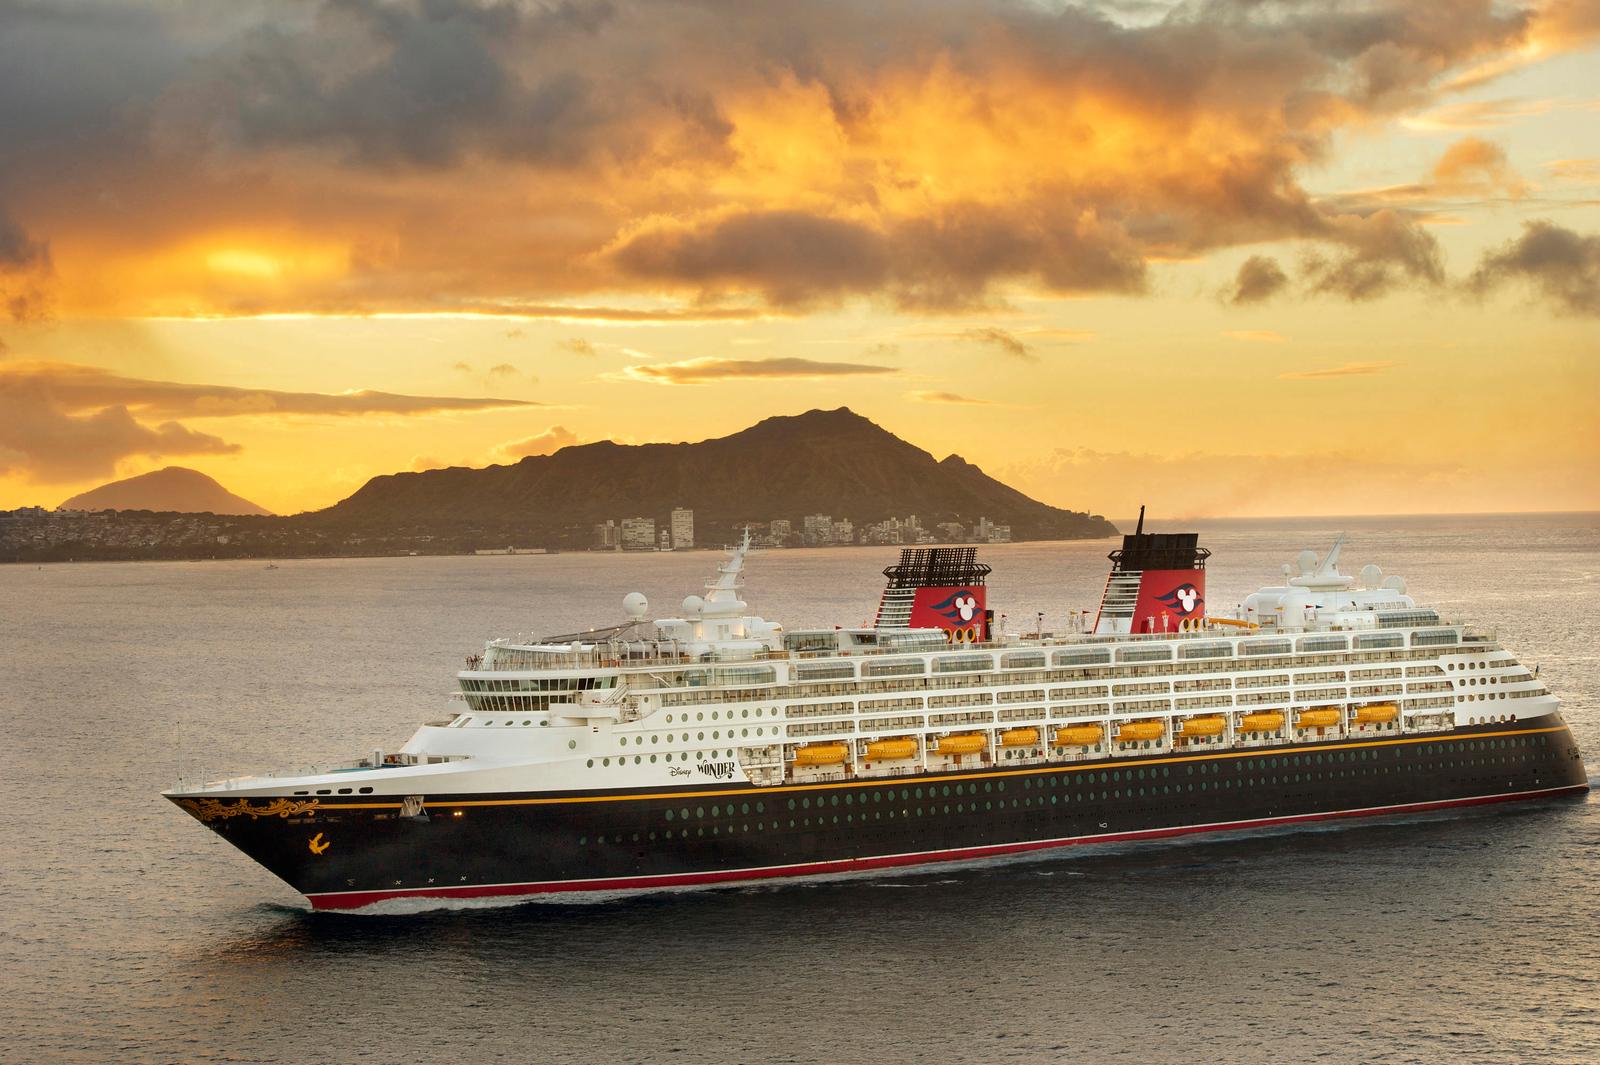 Disney Wonder in Hawaii